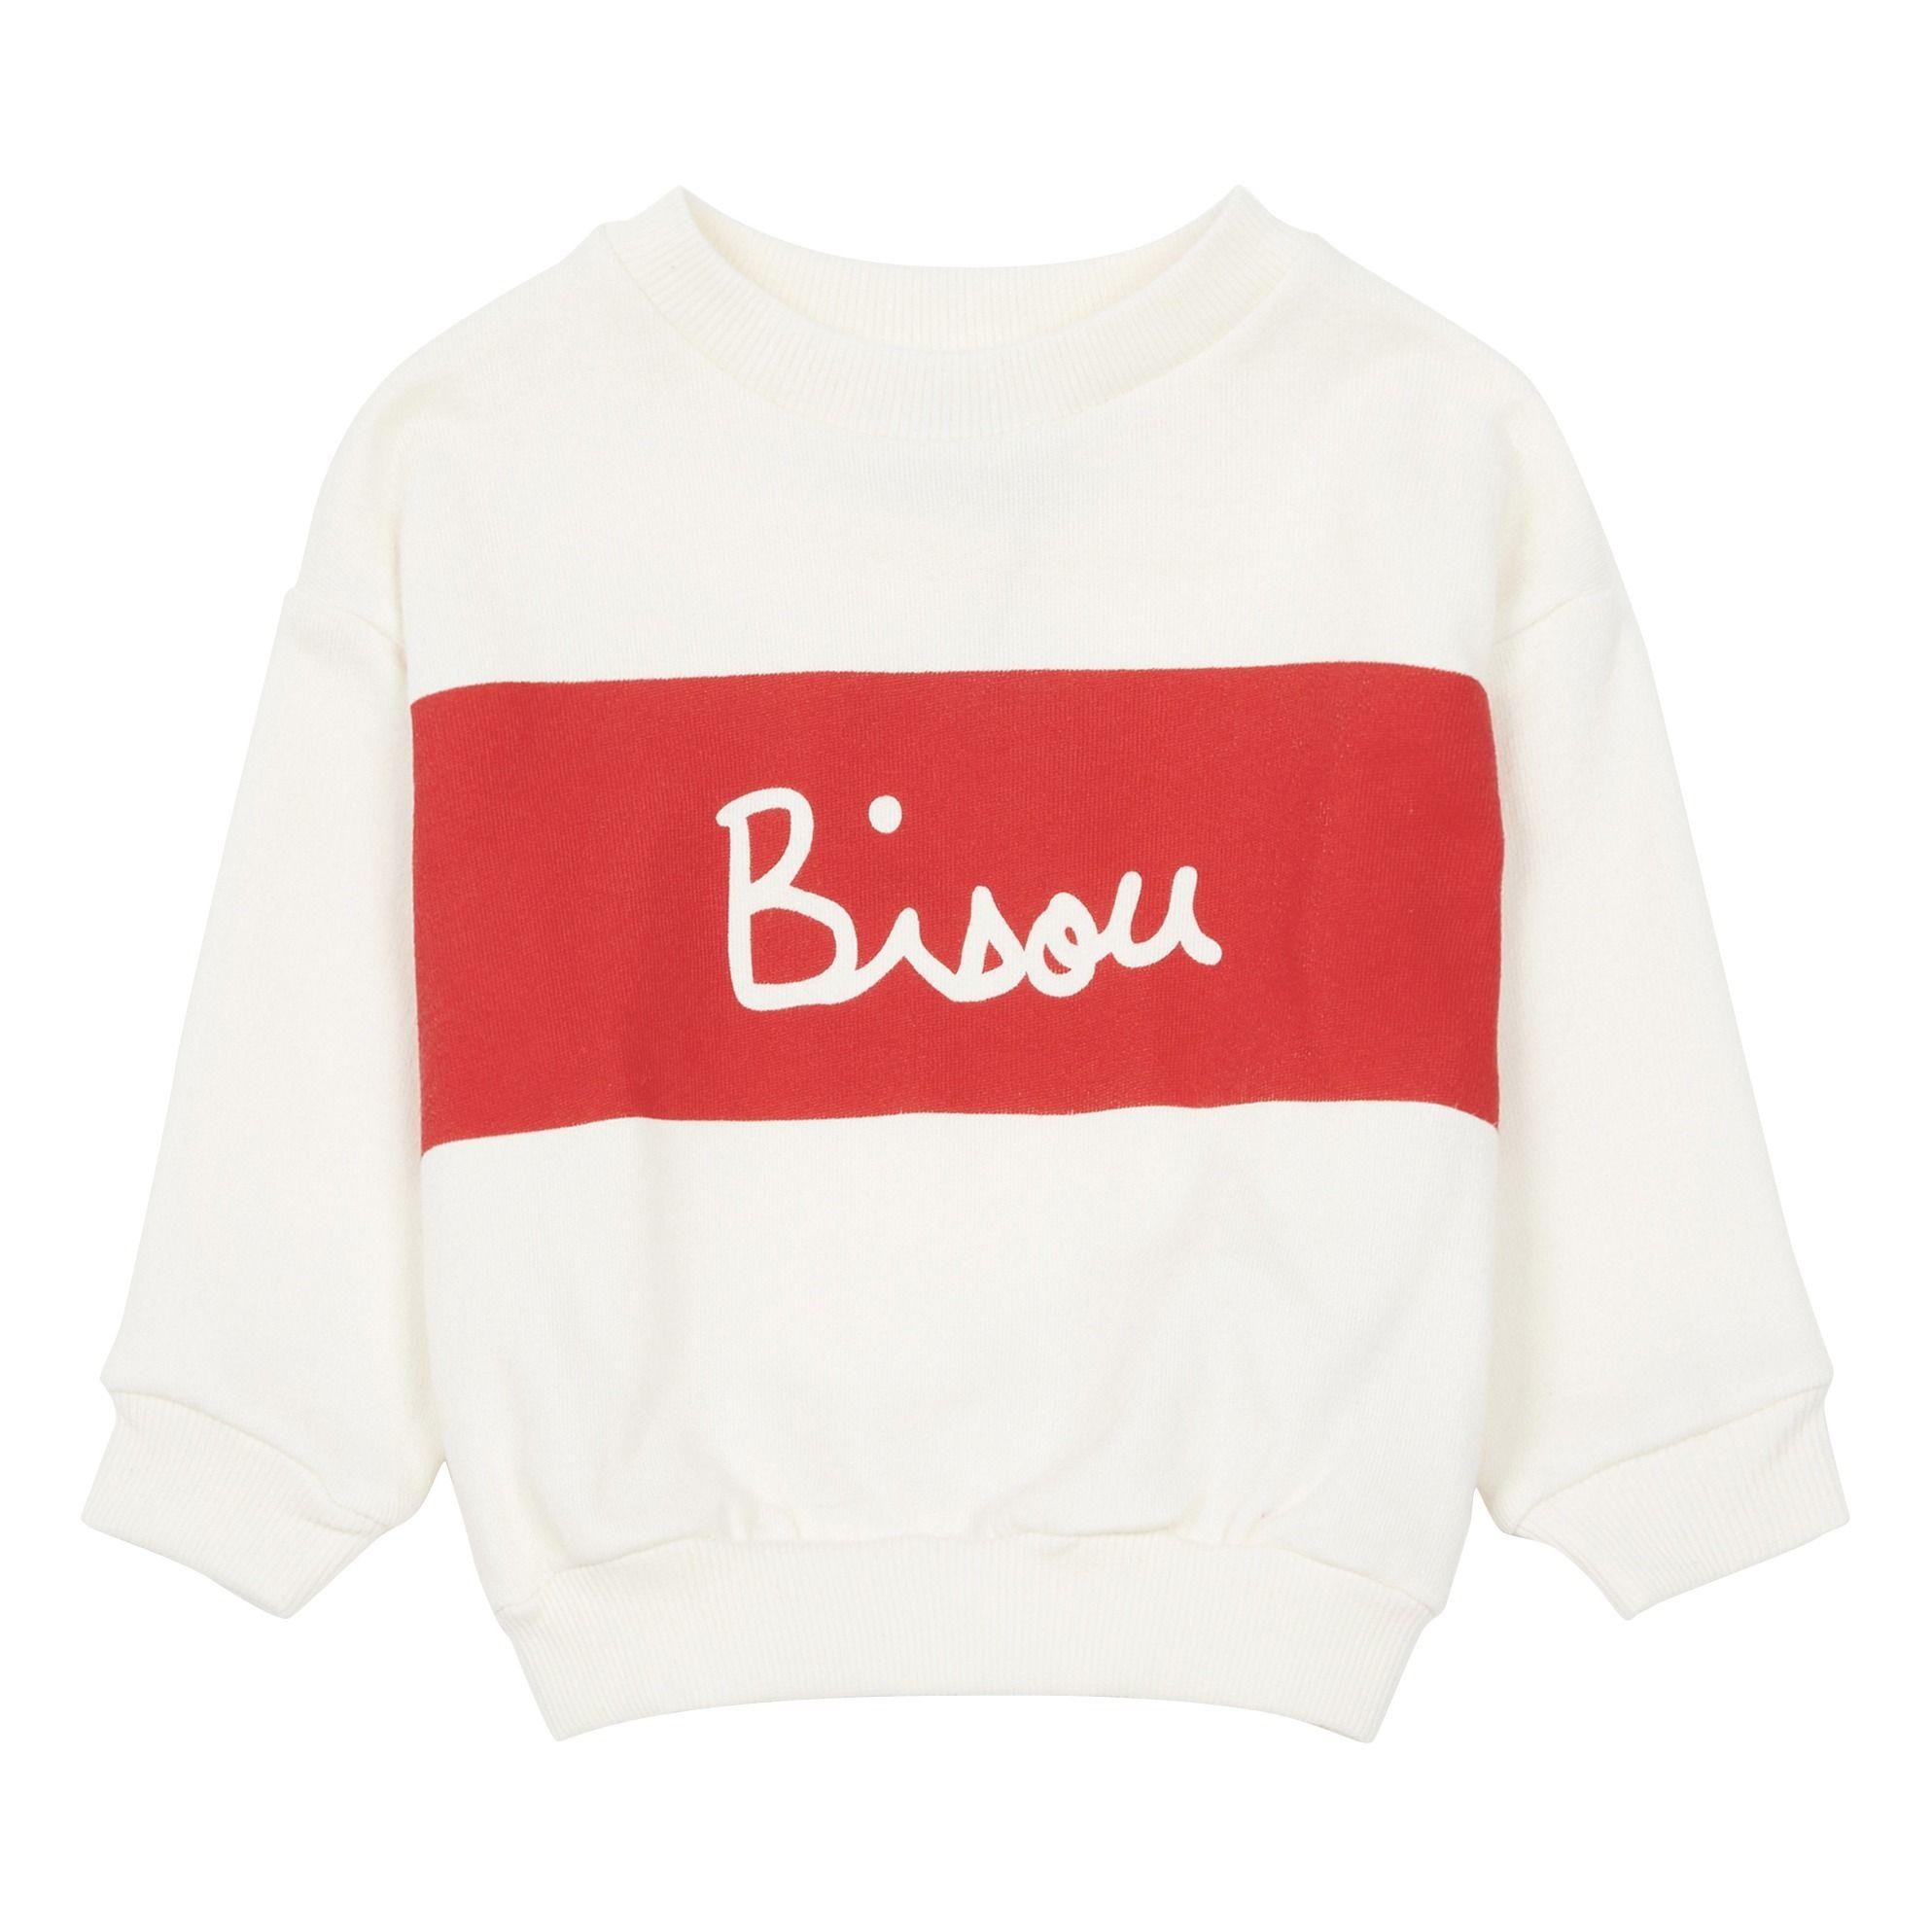 Big Bisou Organic Cotton Sweatshirt White Mathilde Cabanas Cotton Sweatshirts White Sweatshirt Sweatshirts [ 1987 x 1987 Pixel ]